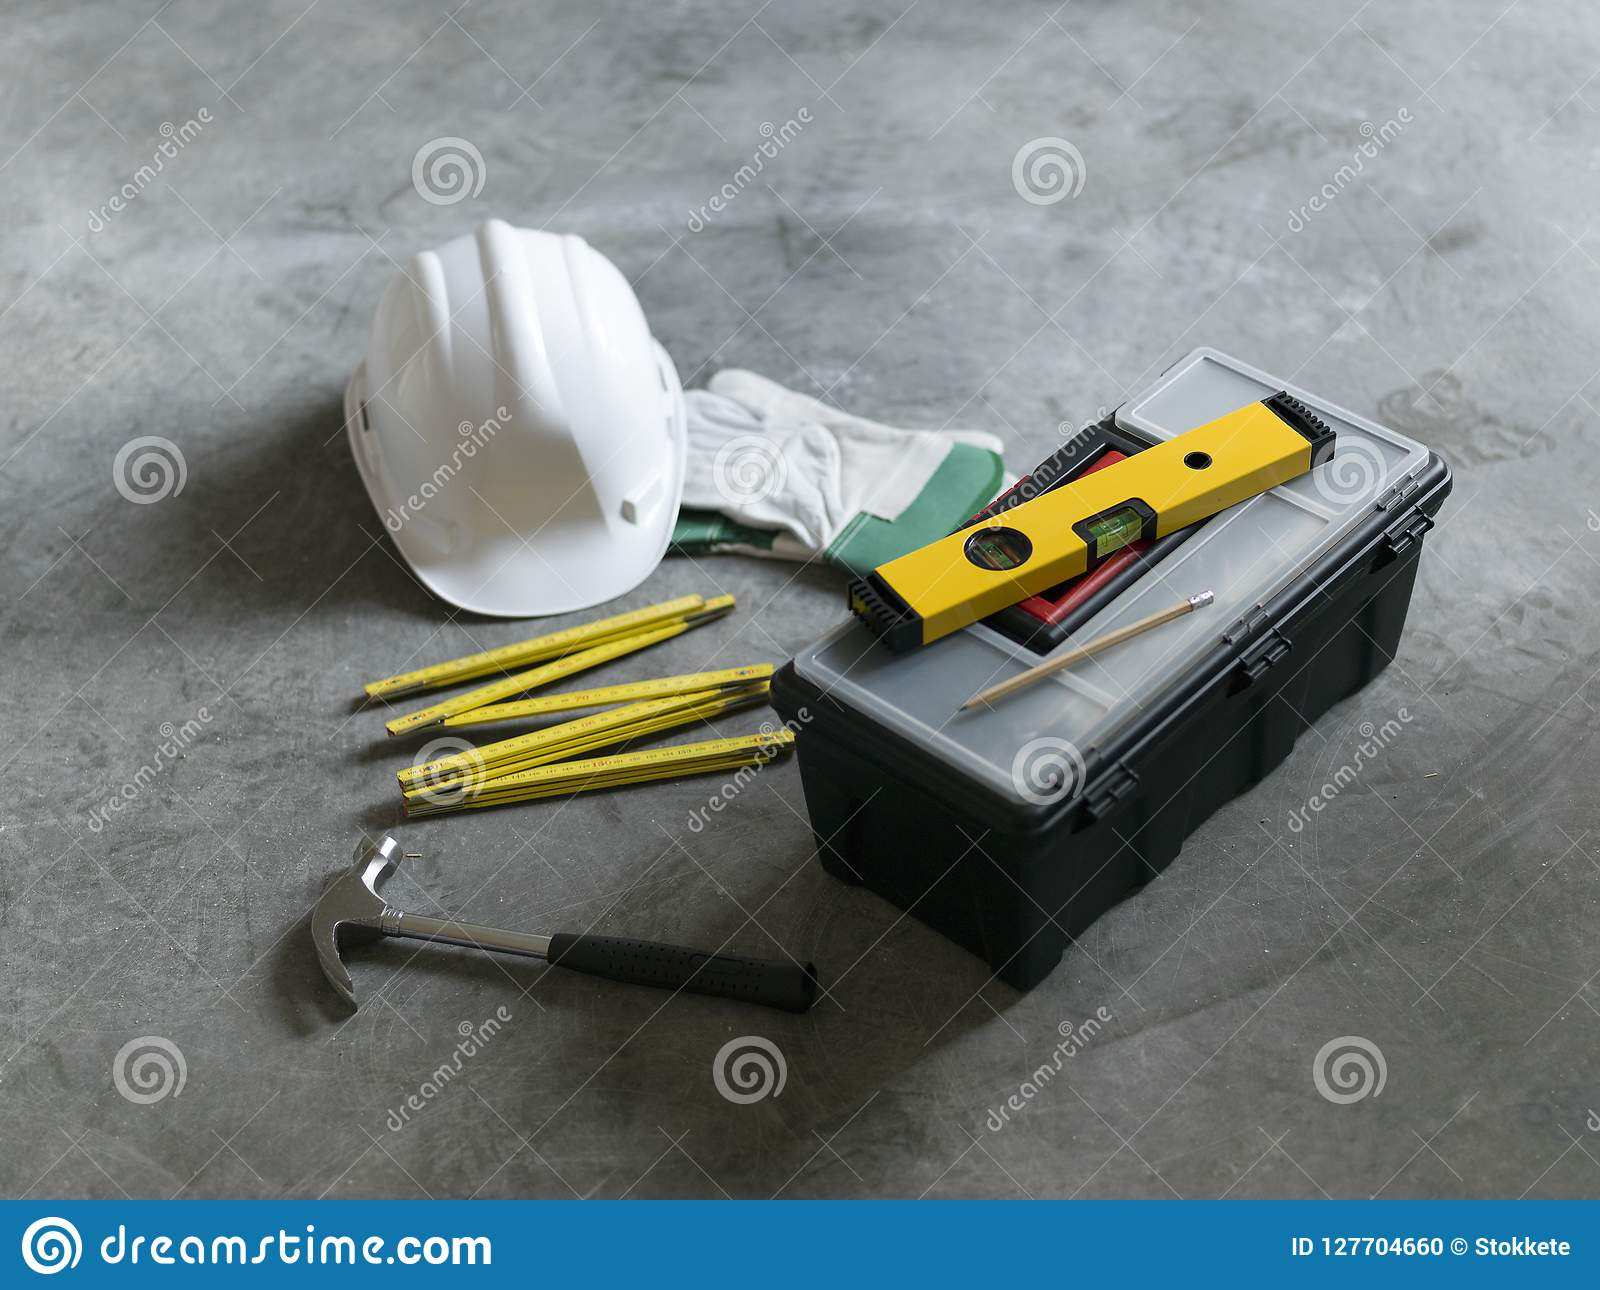 Home renovation and DIY tools still life